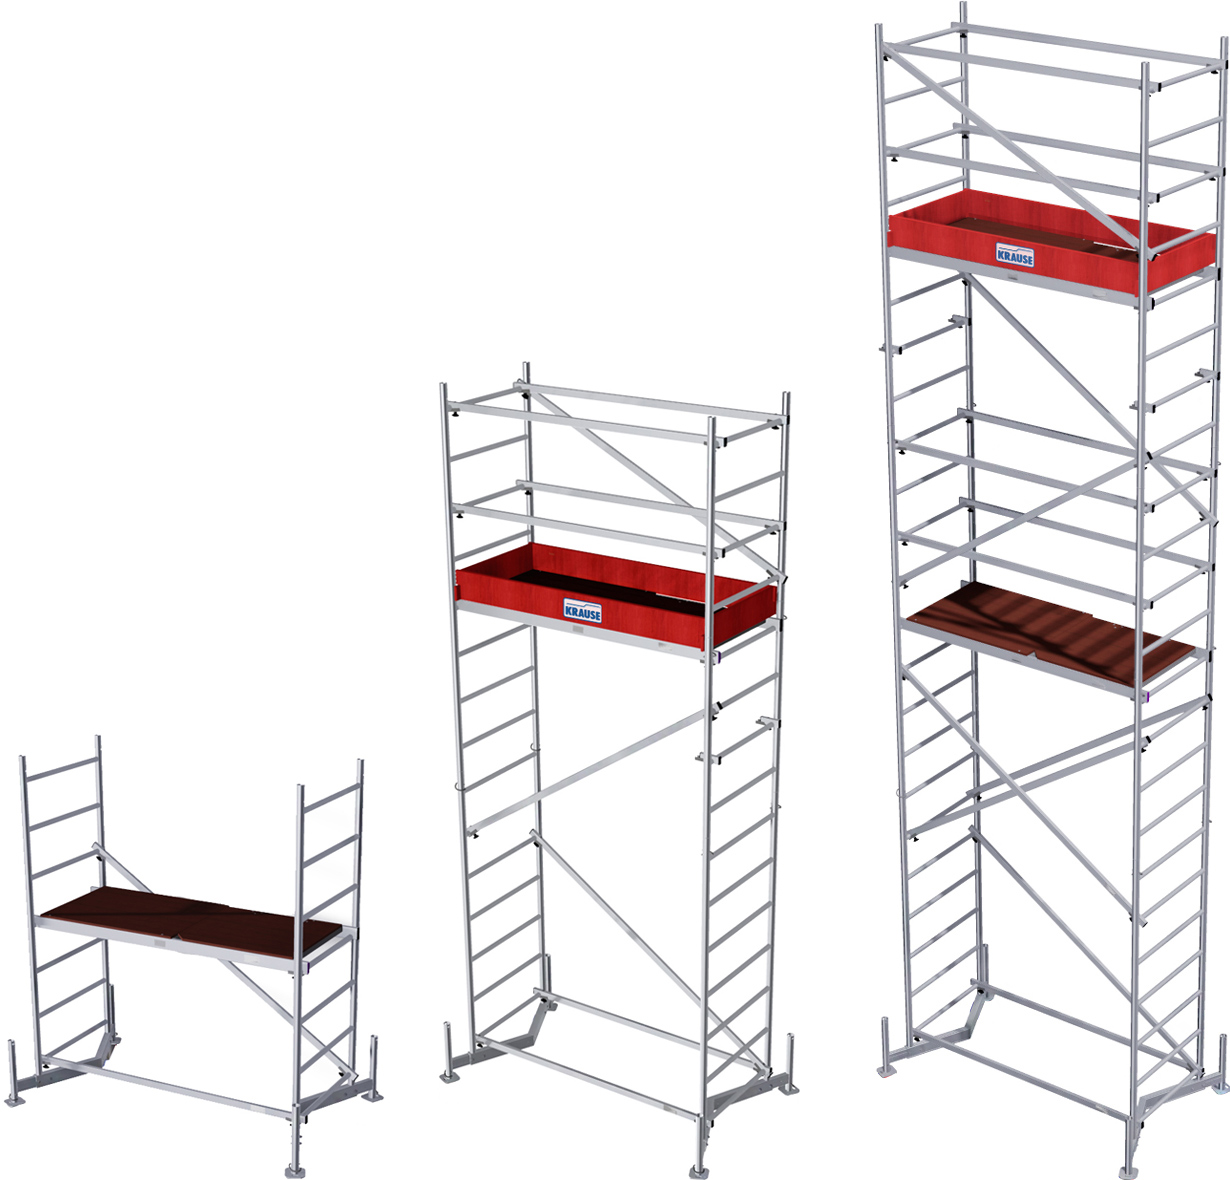 Gerüst Krause Monto ClimTech Alu 0,65x1,50m